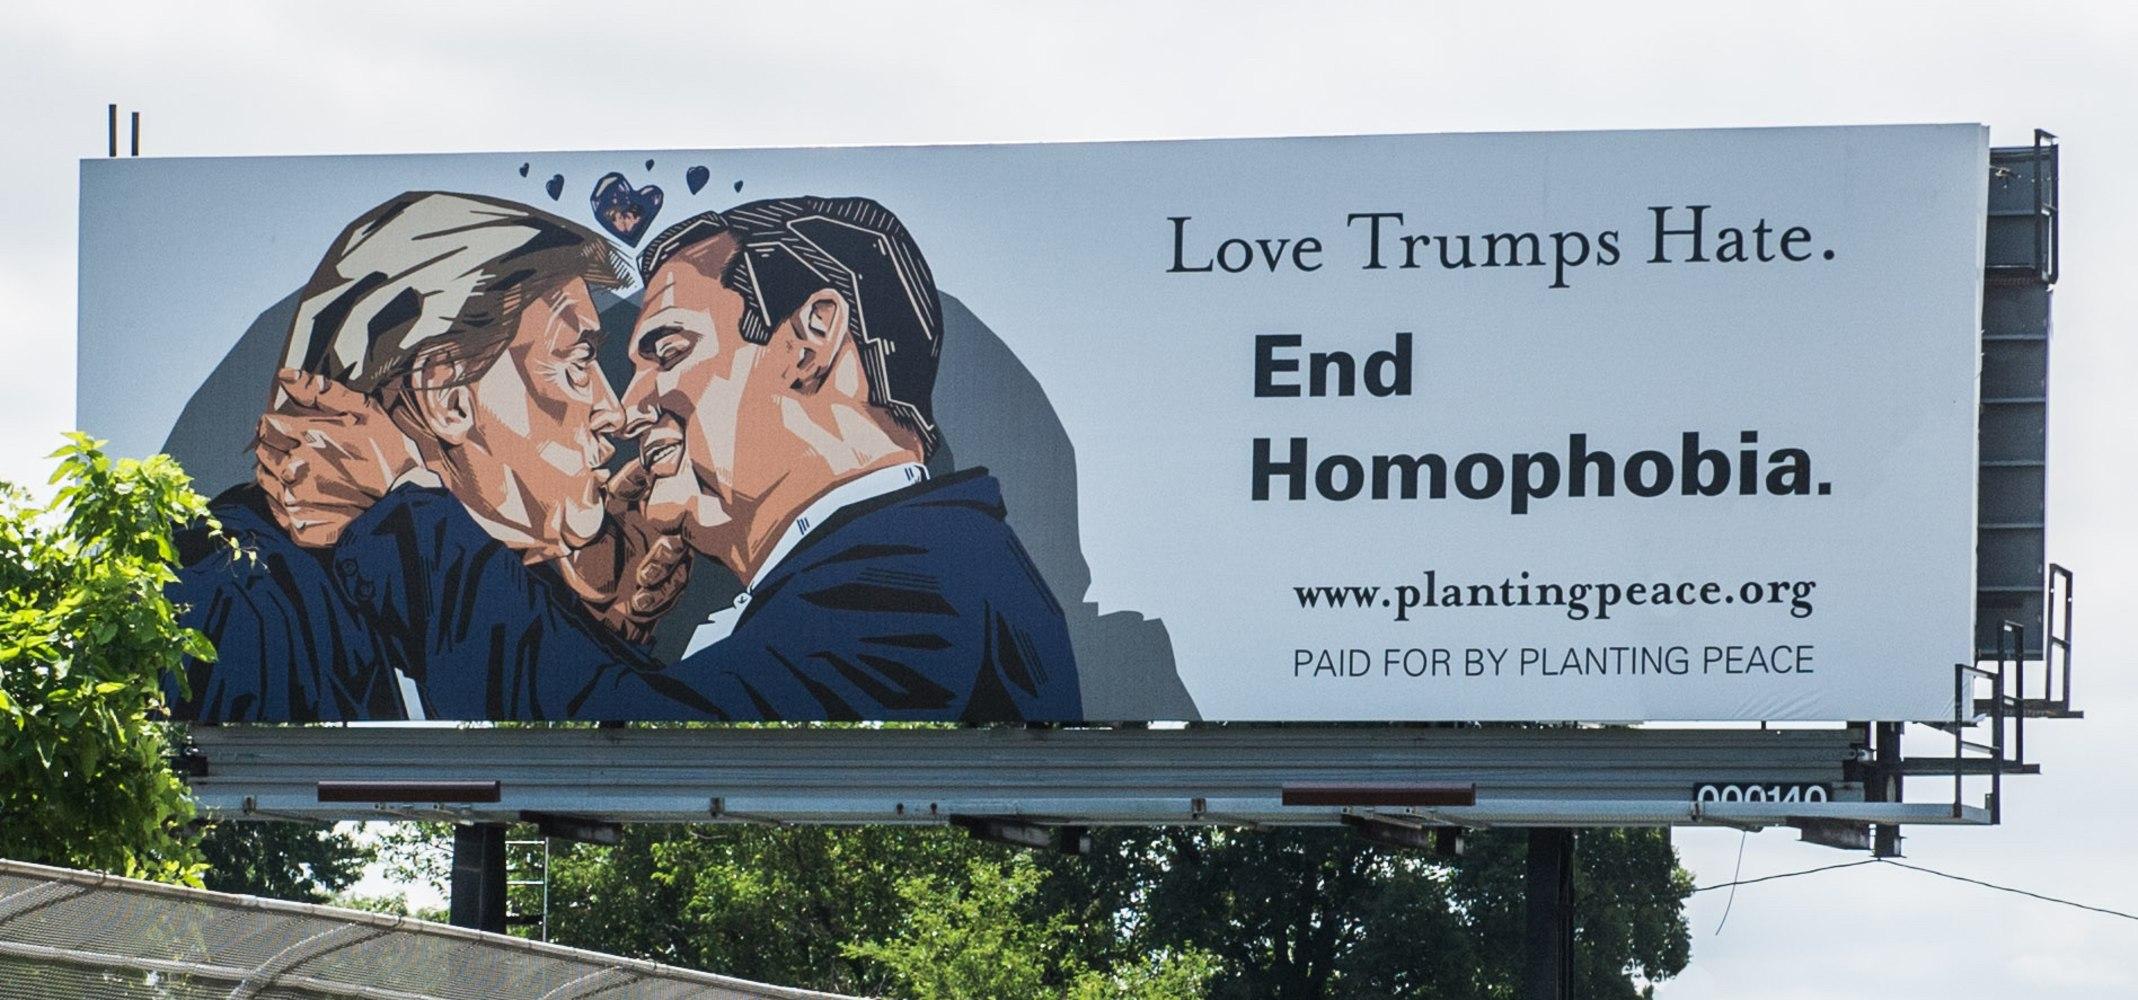 Billboard Of Trump Cruz Kissing Goes Up In Cleveland